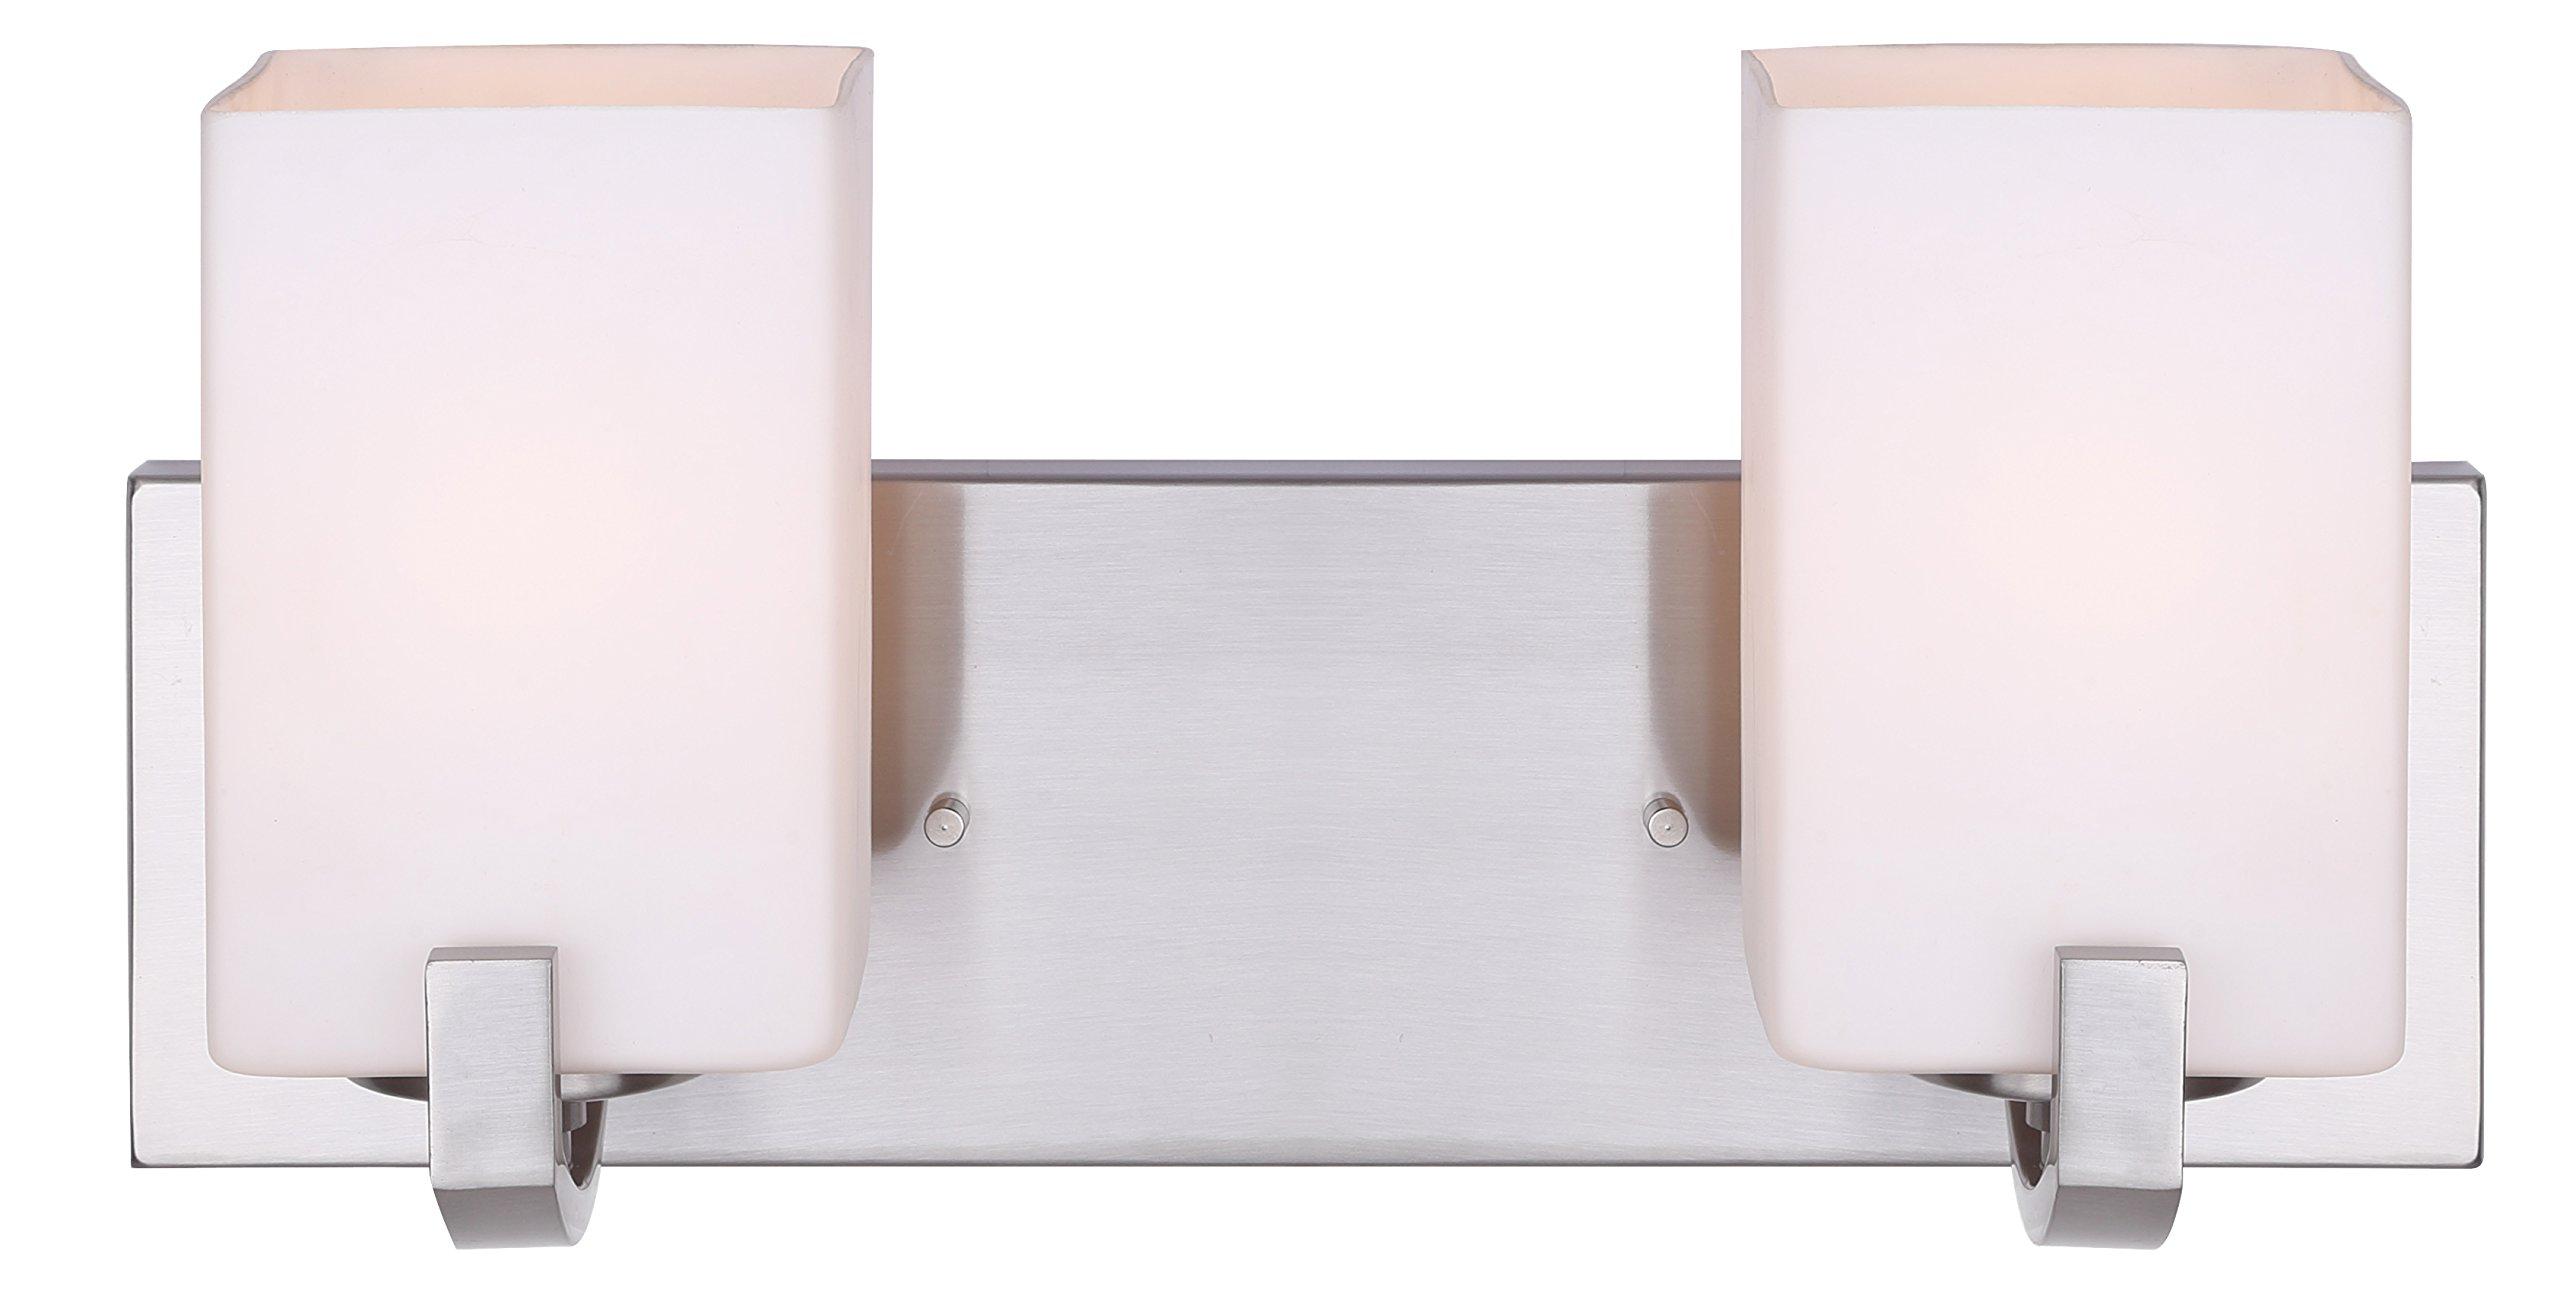 Canarm IVL422A02BN Palmer 2-Light Bath Vanity